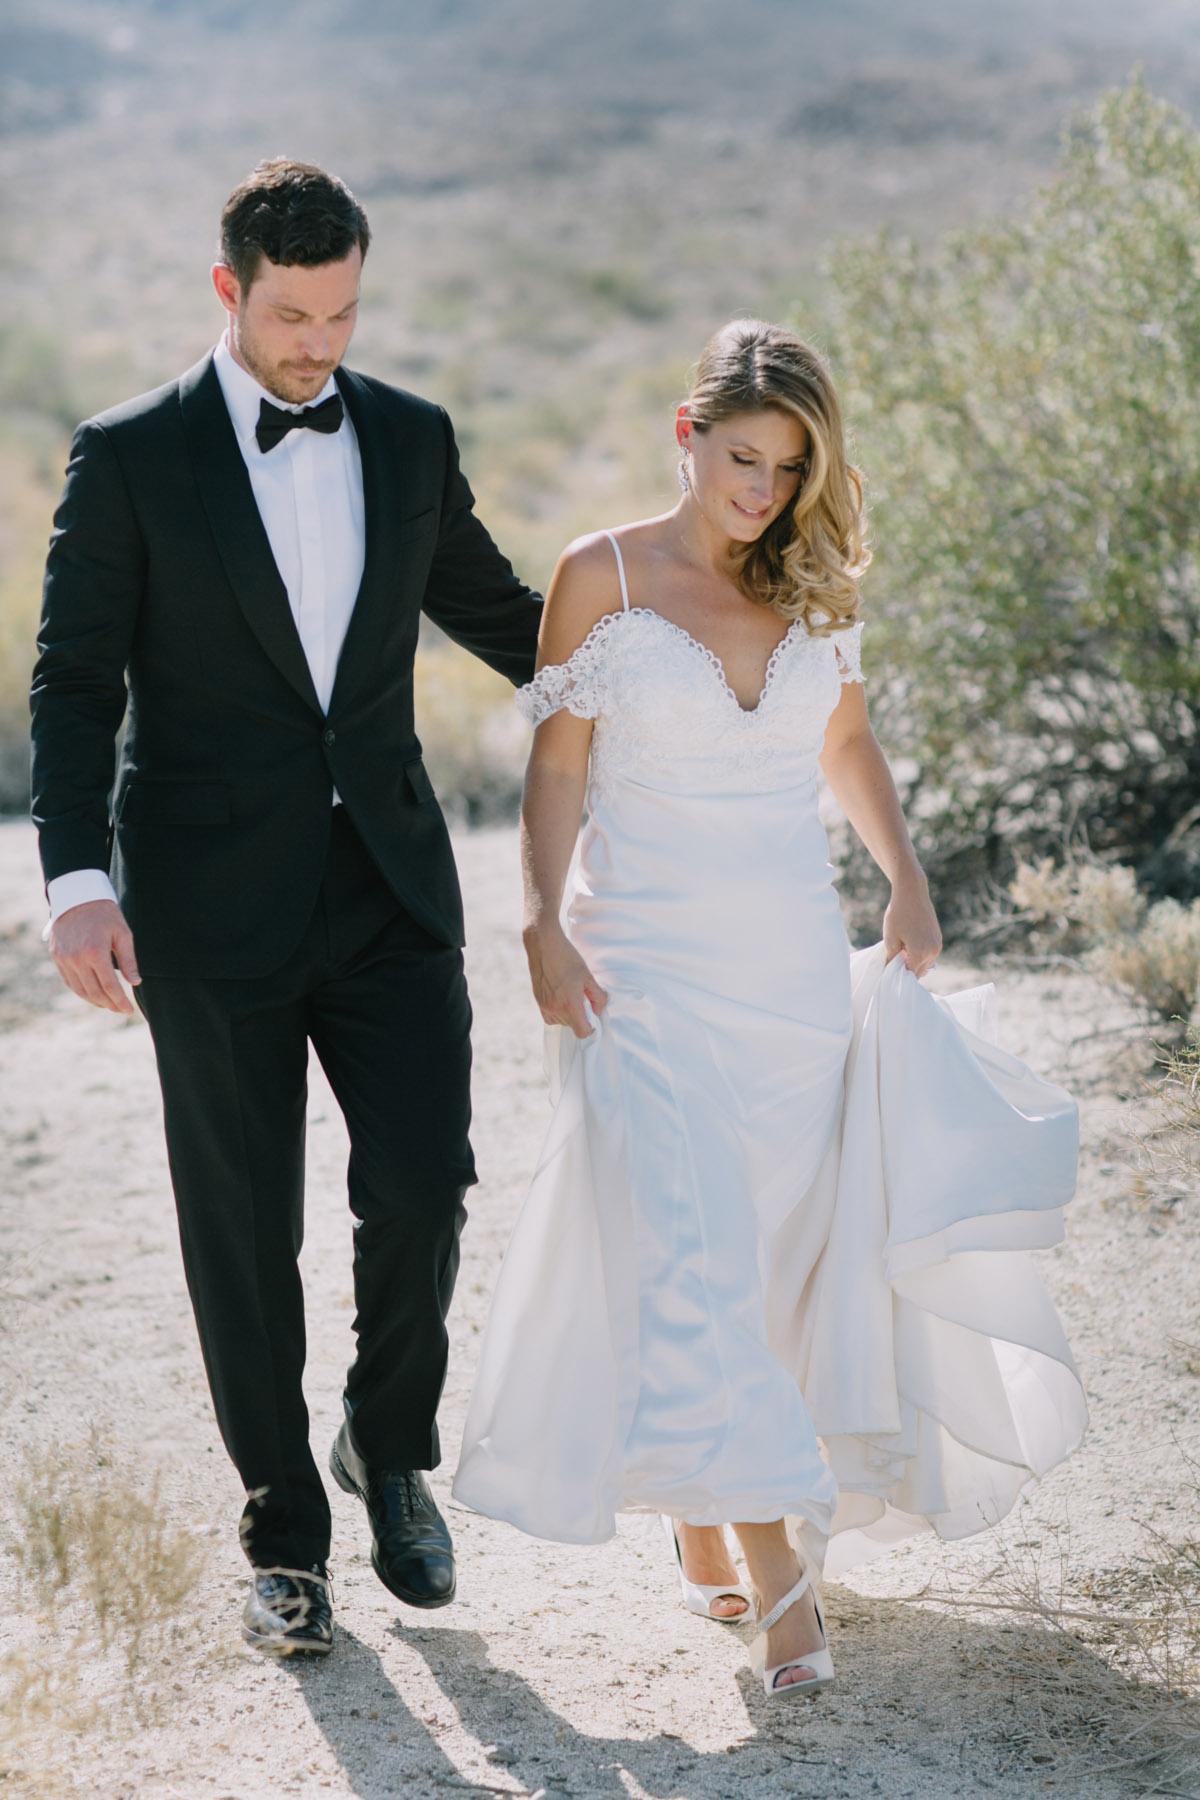 Ace Hotel and Swim Club Palm Springs Wedding Photography-029.jpg